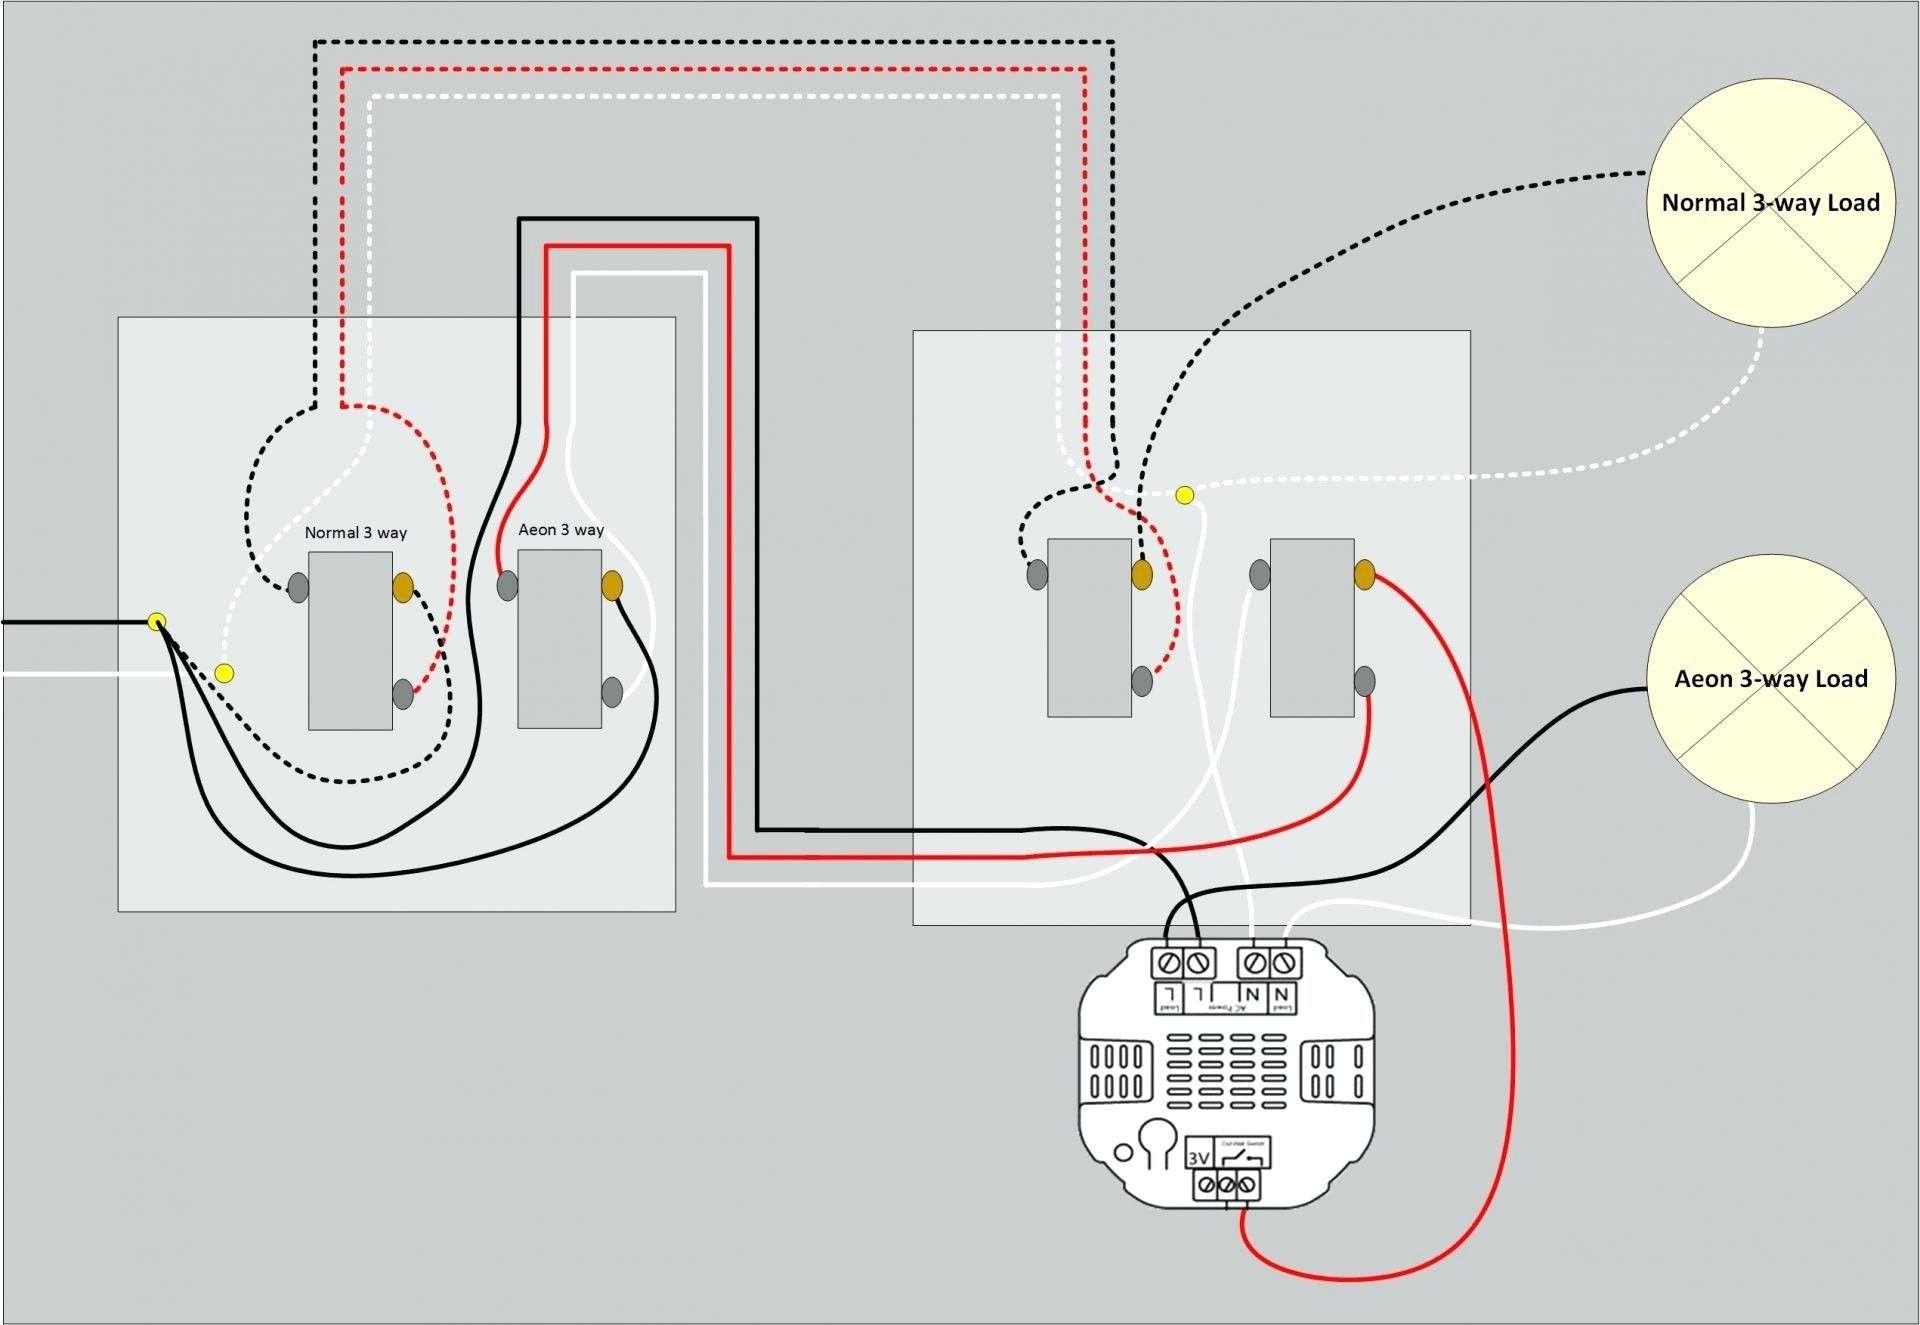 key wiring diagram chart wiring diagram on murray lawn mower wiring diagram  [ 1920 x 1325 Pixel ]